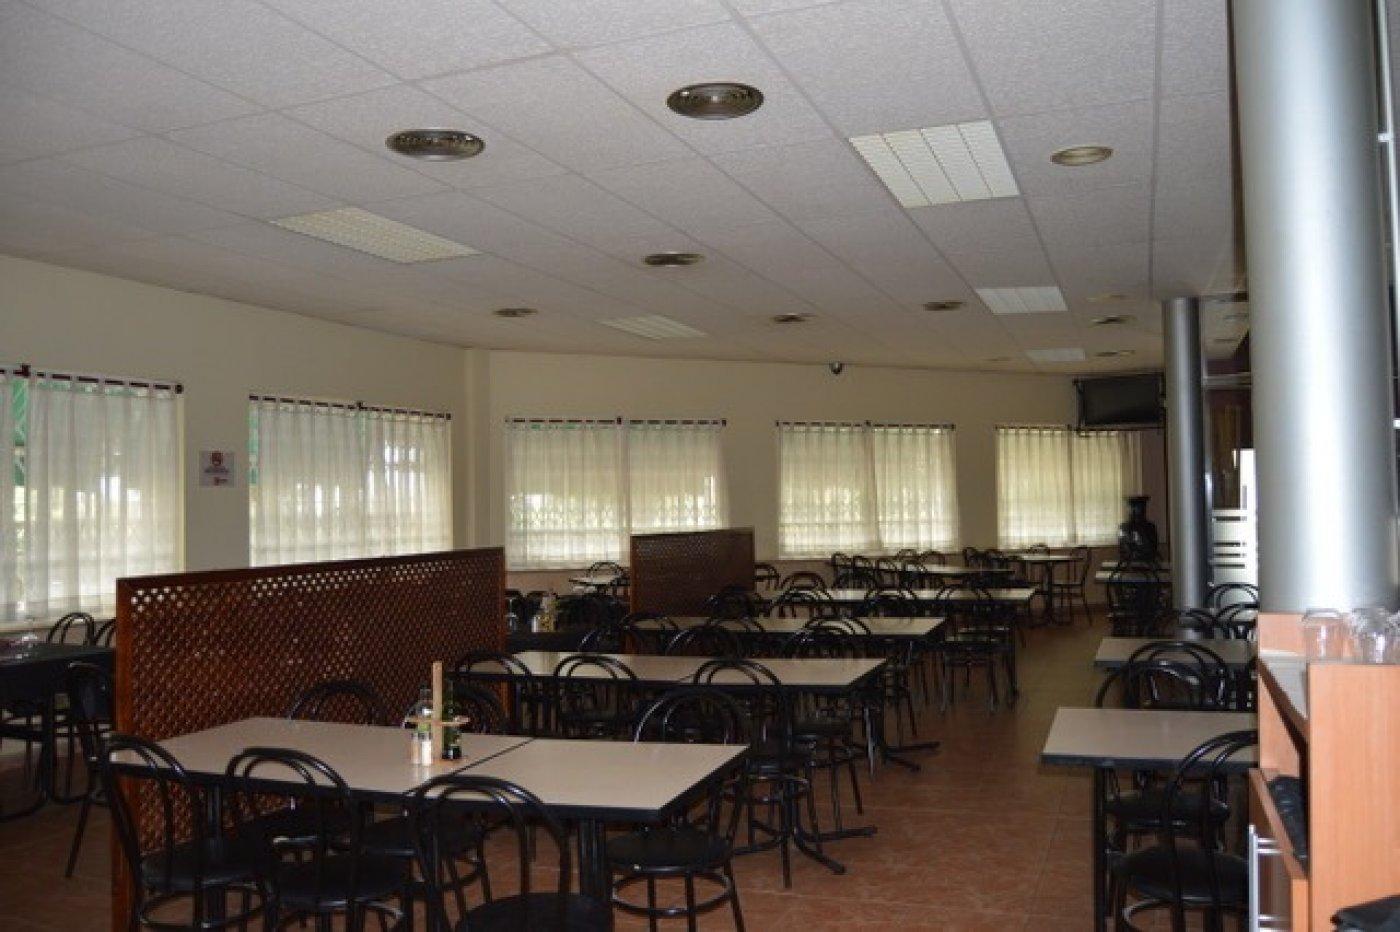 Nave restaurante en polígono cerca de sant sadurní d´anoia - imagenInmueble25